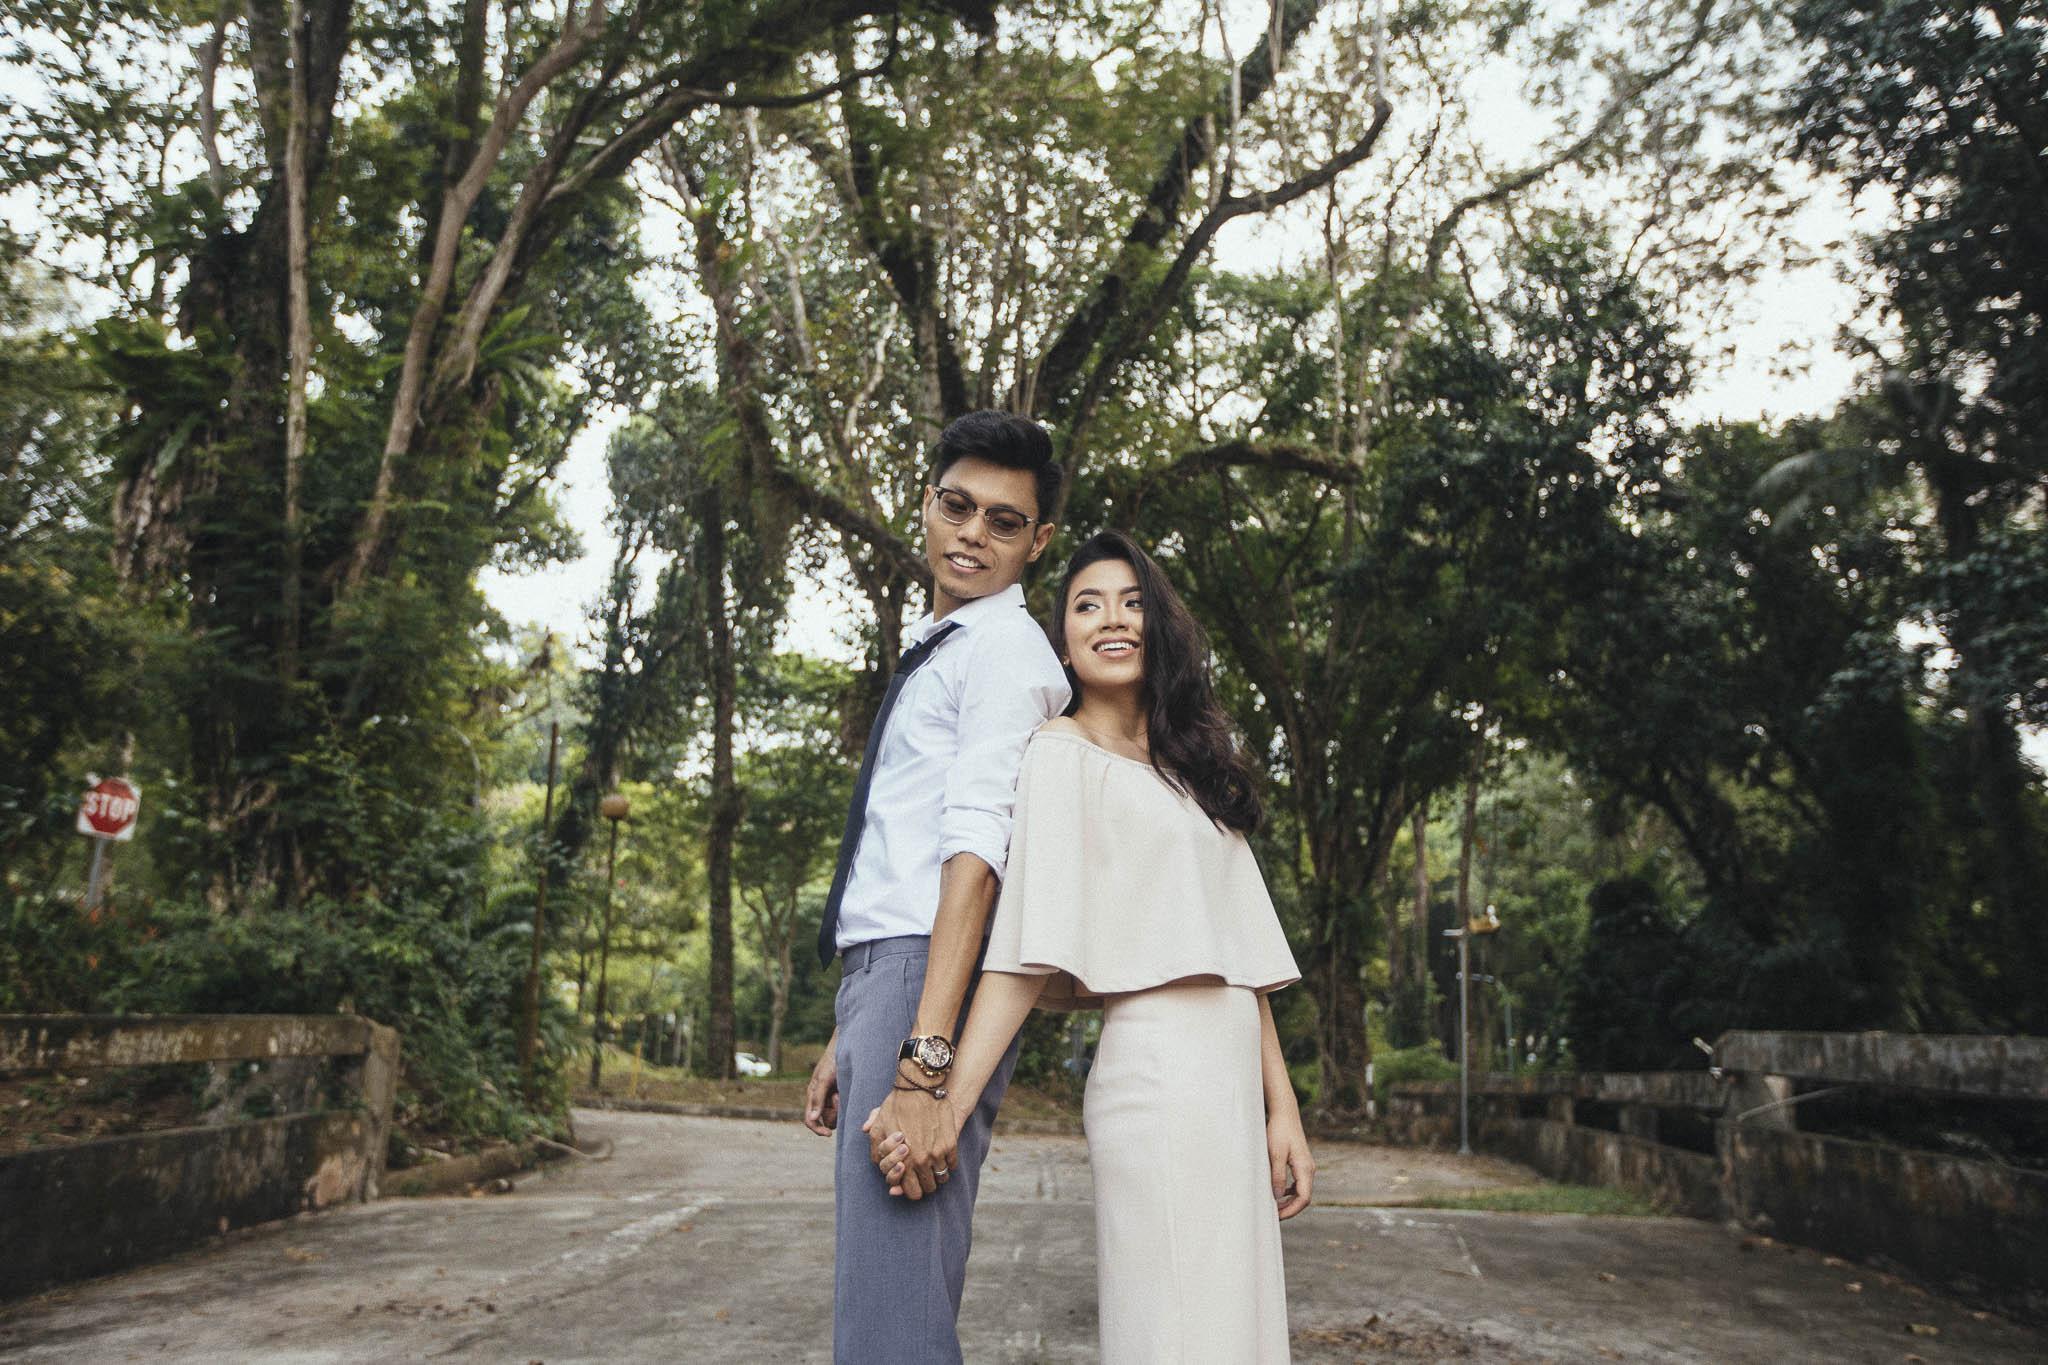 singapore-wedding-photographer-malay-travel-adli-tashah-11.jpg